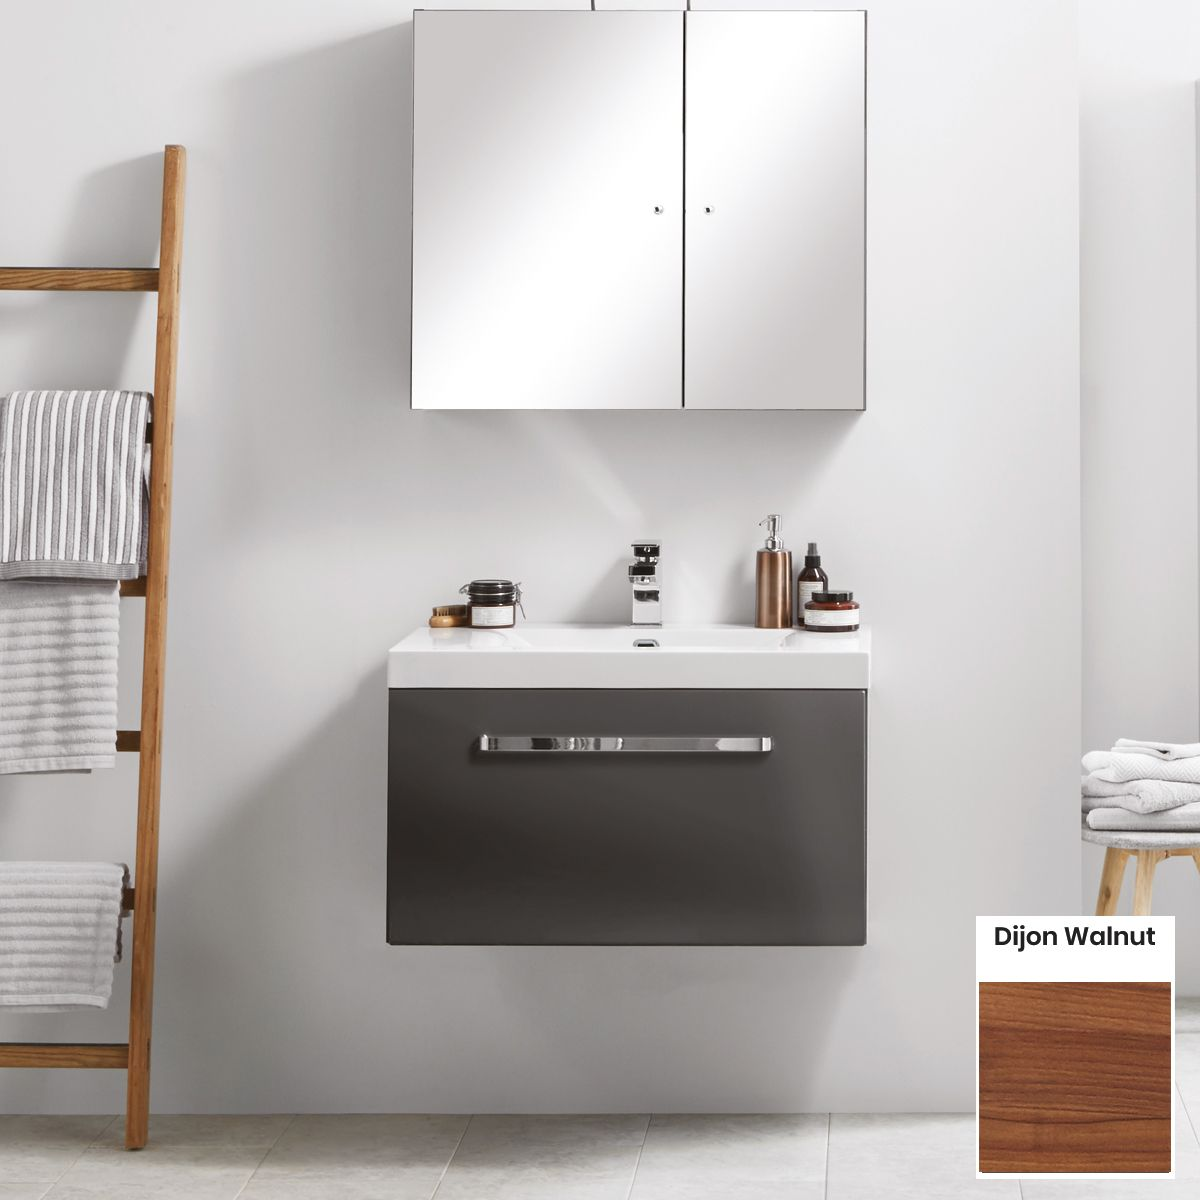 Elation Eko Dijon Walnut Vanity Unit with Slab Drawer 750mm